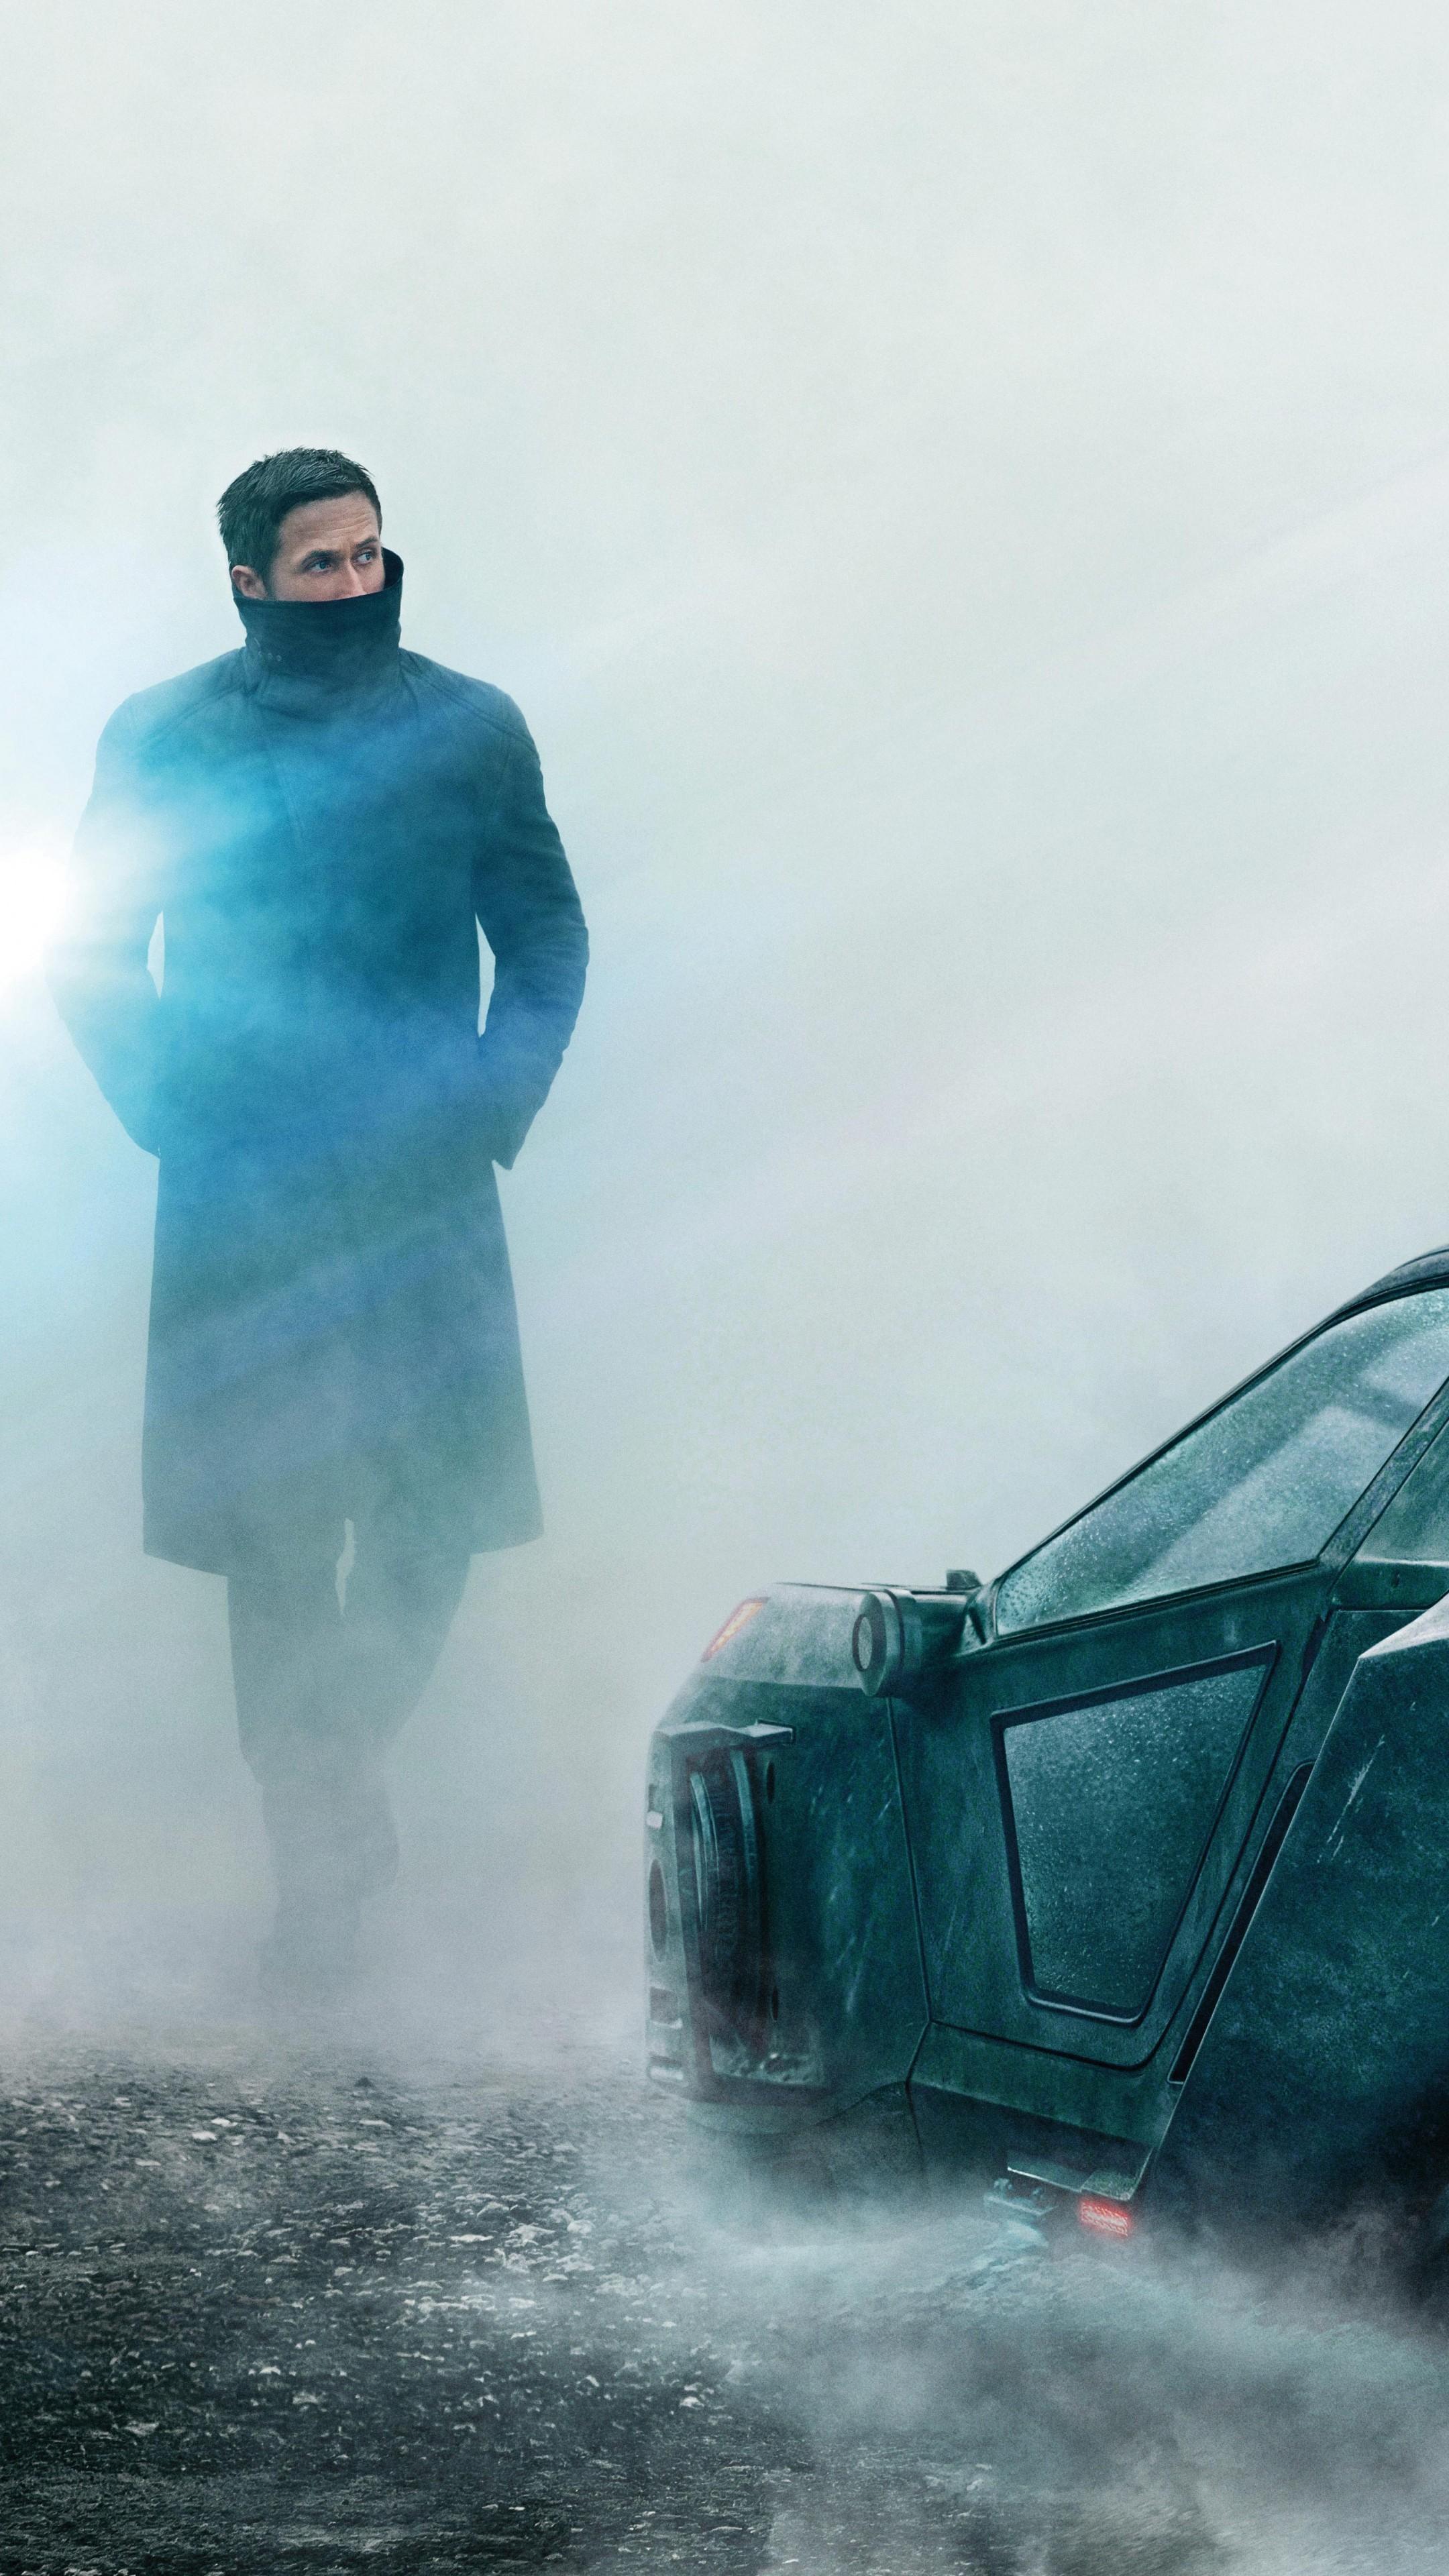 Wallpaper Blade Runner 2049 Ryan Gosling 8k Movies 14121